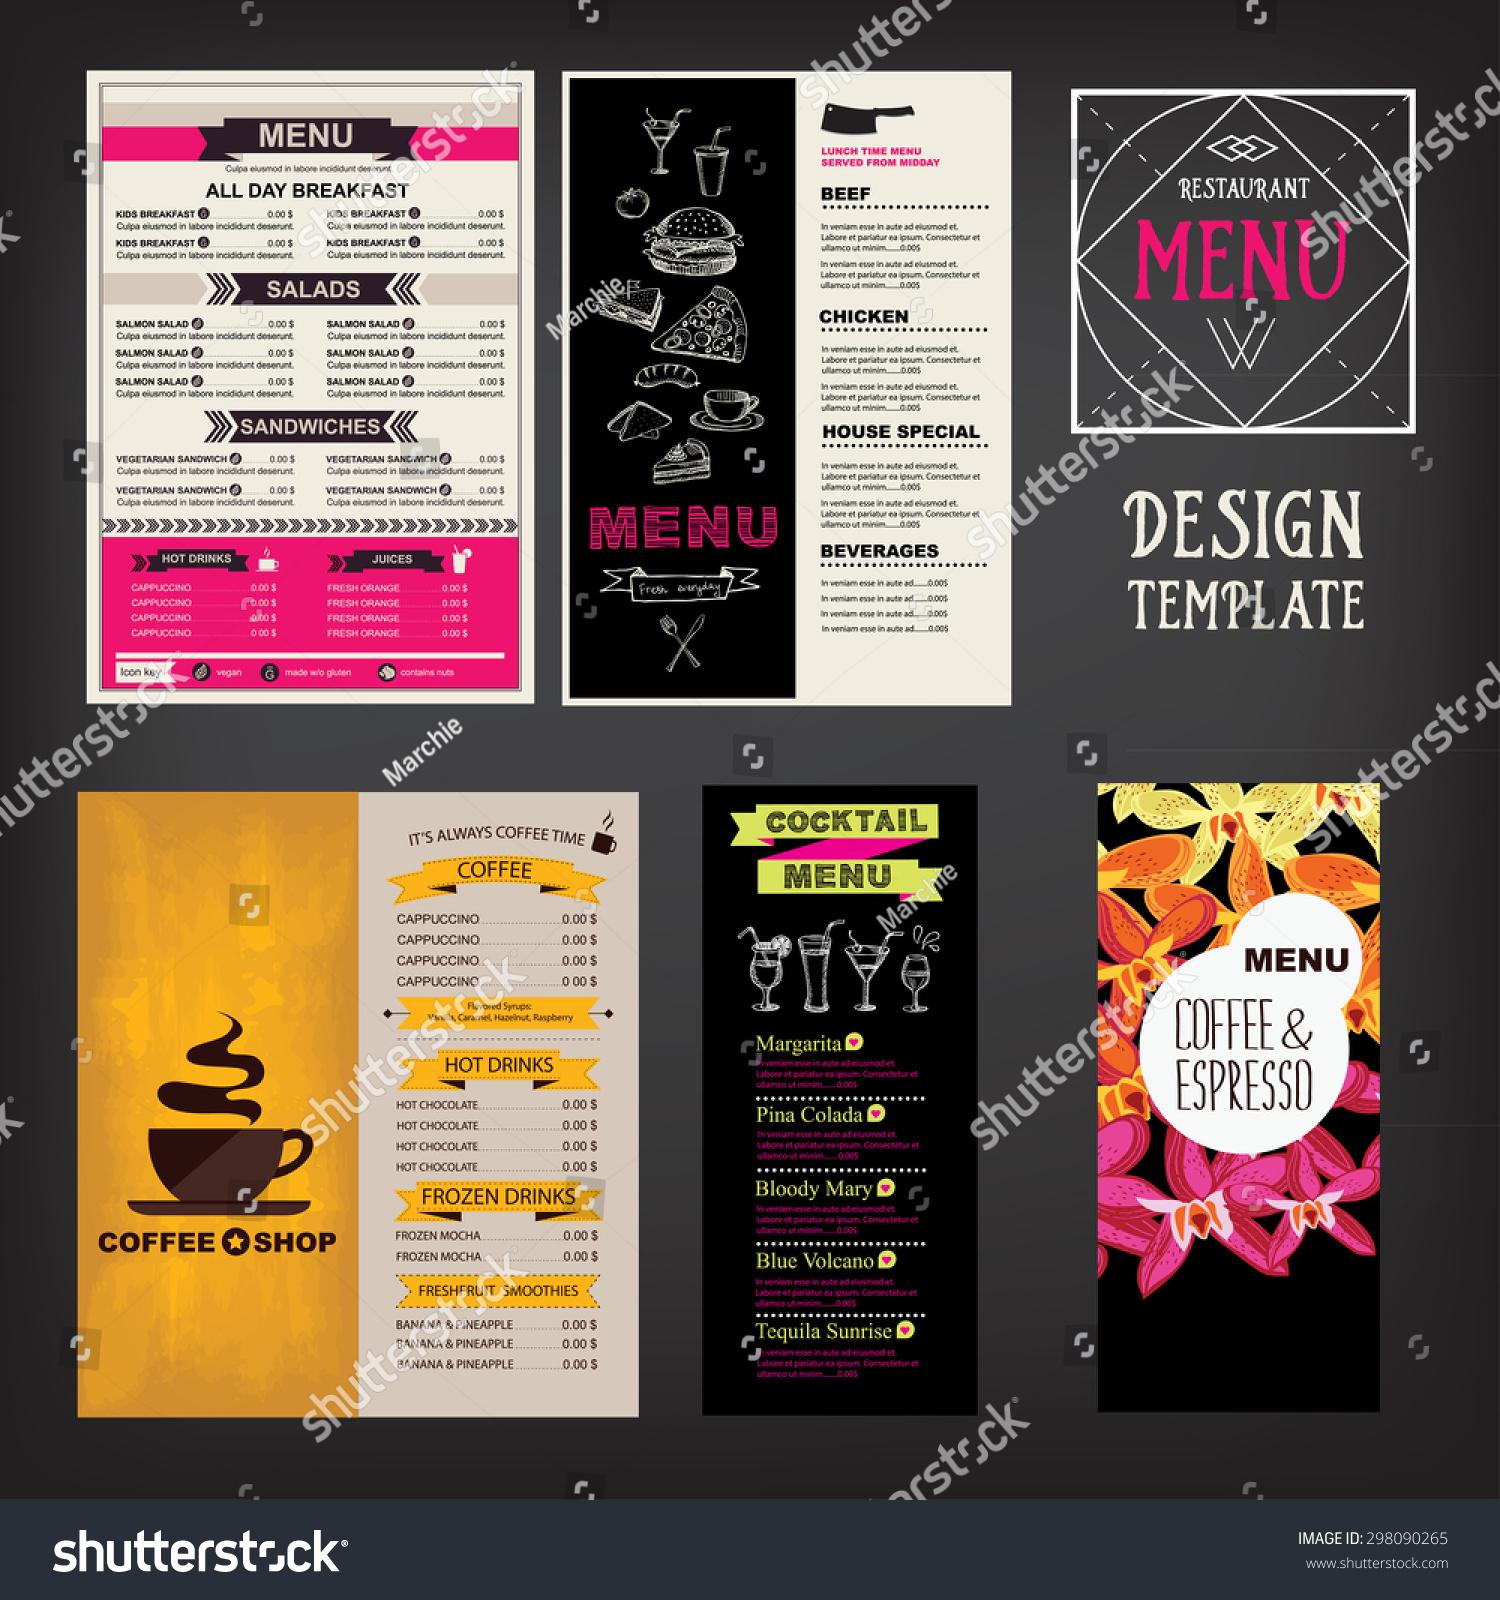 Restaurant cafe menu template design food stock vector